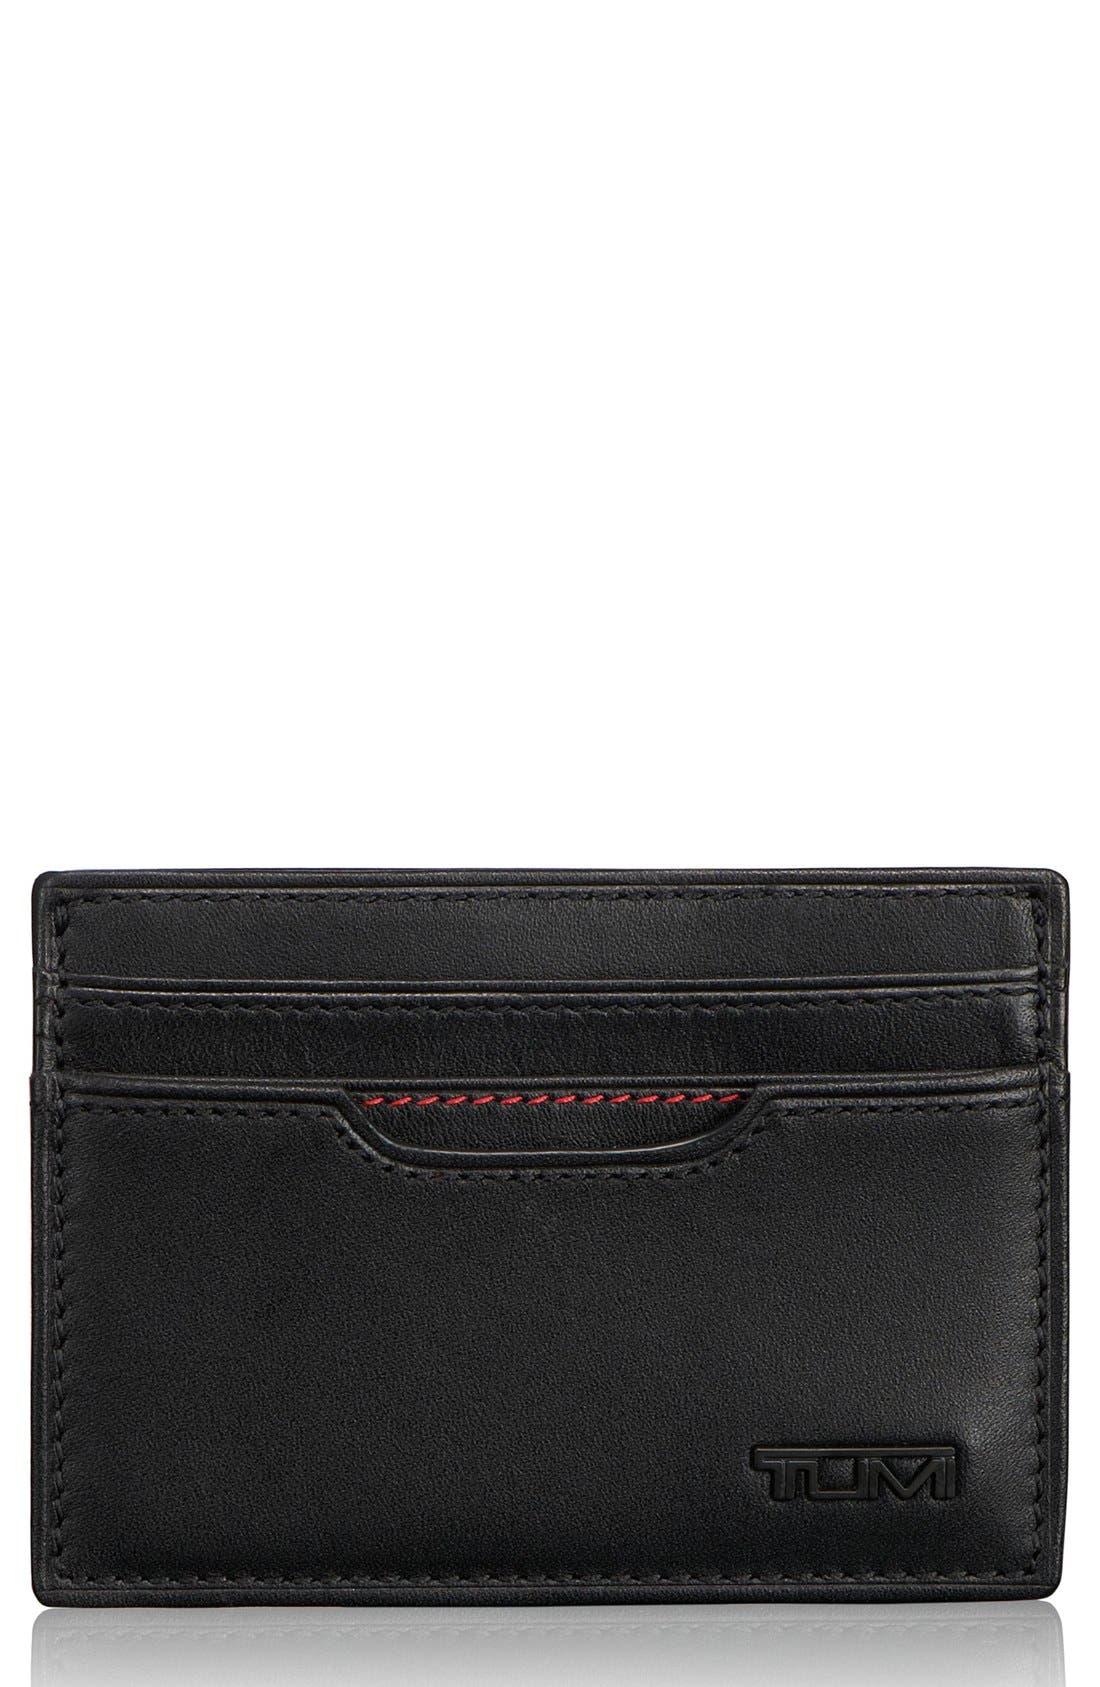 TUMI, Delta - ID Lock<sup>™</sup> Shielded Money Clip Card Case, Main thumbnail 1, color, BLACK